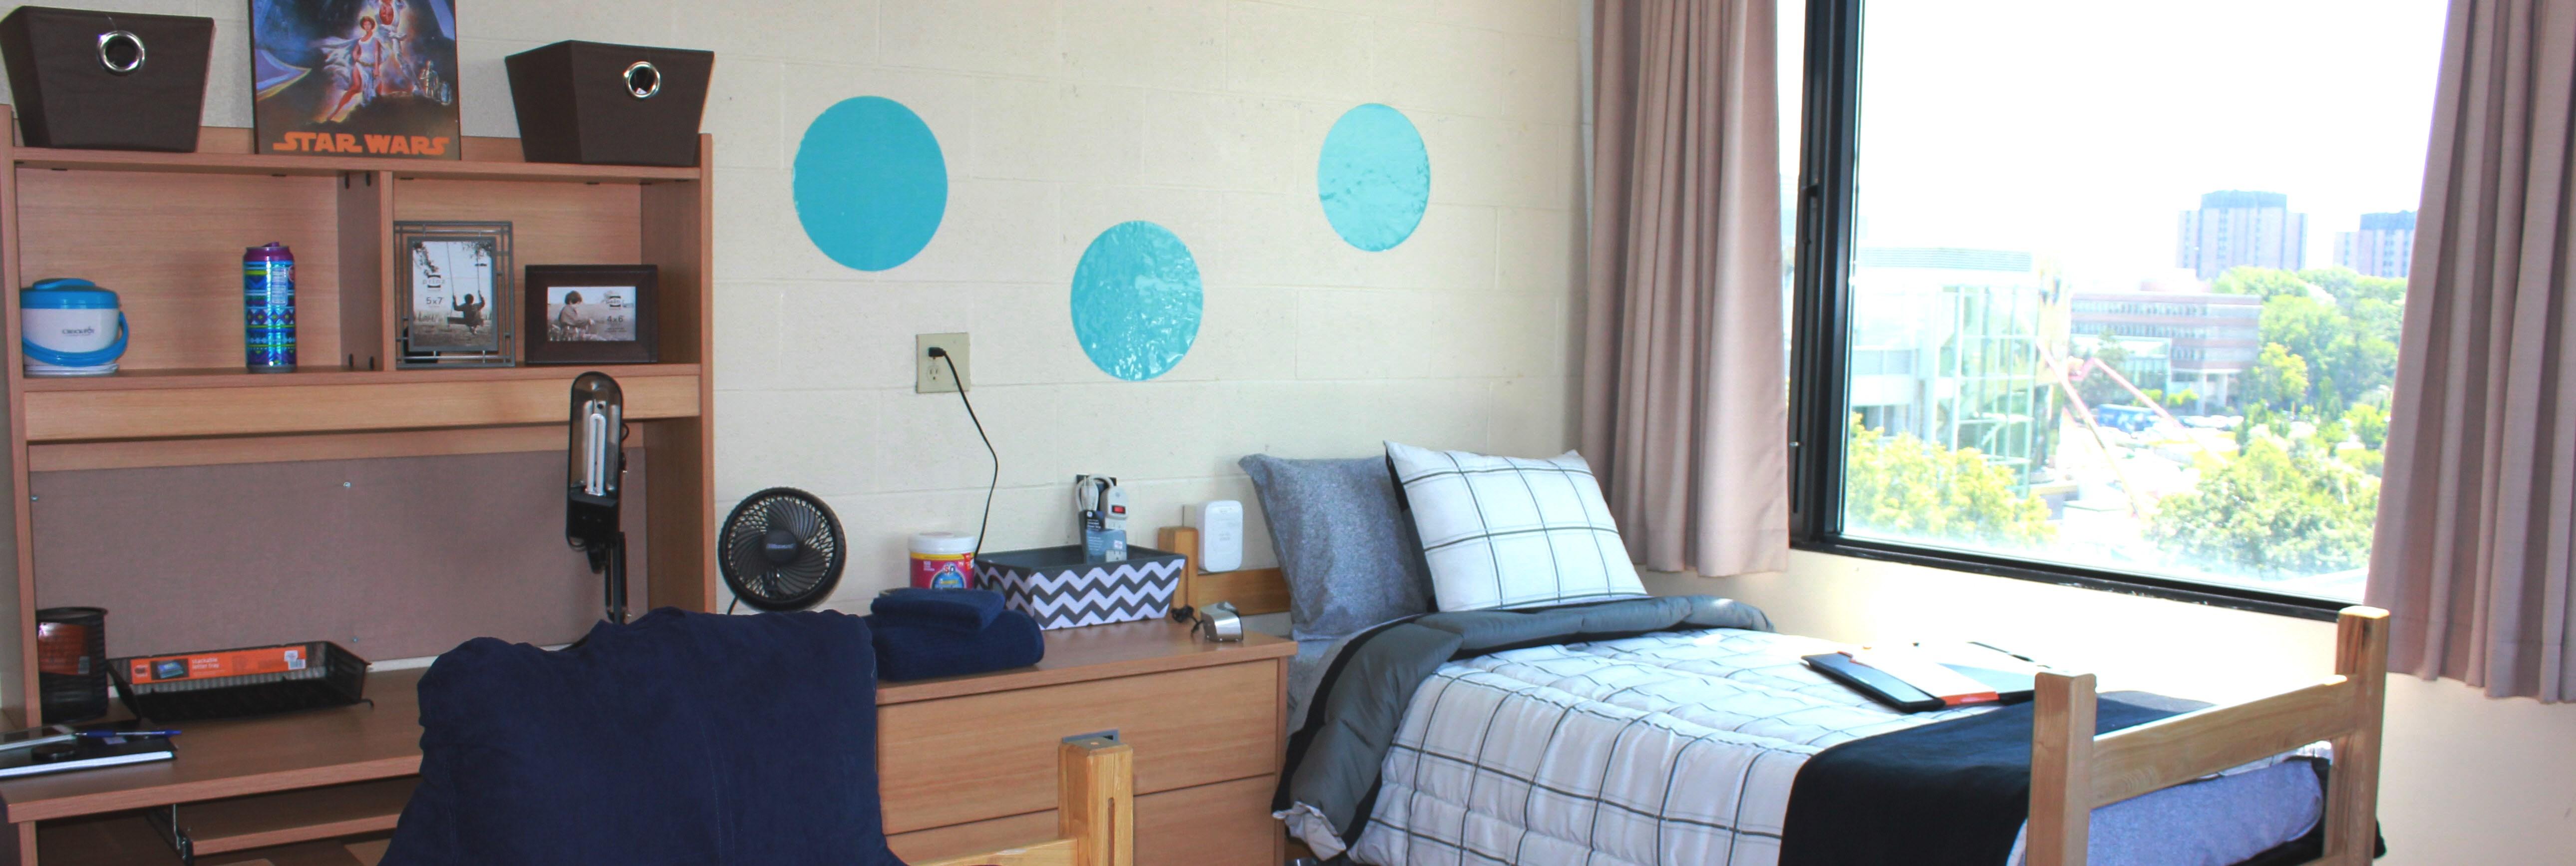 Bethune residence double room